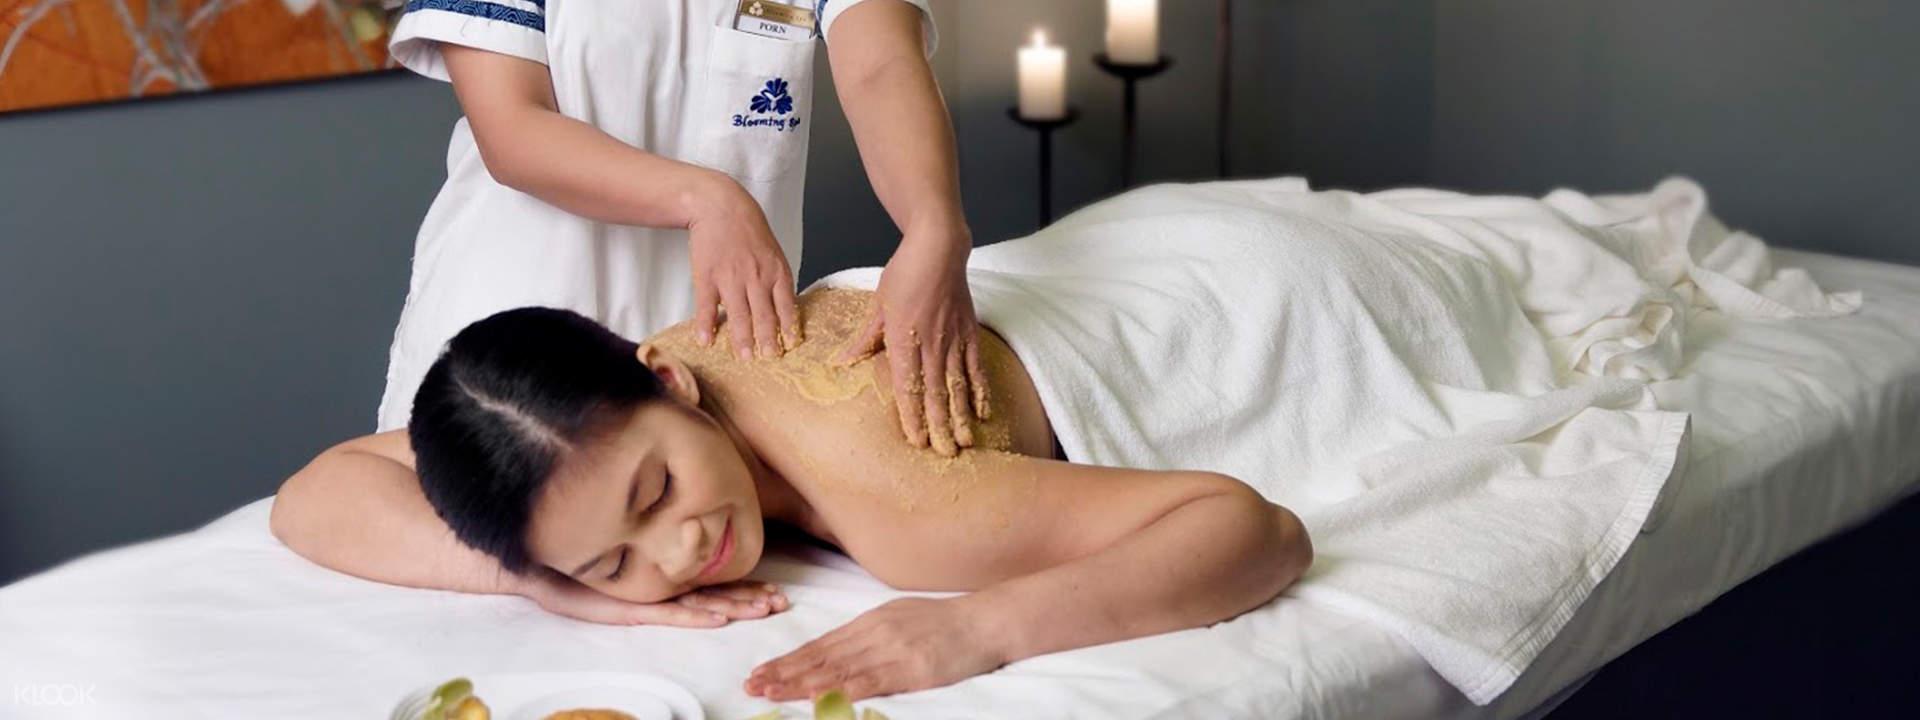 gay massage oslo hvordan stimulere klitoris